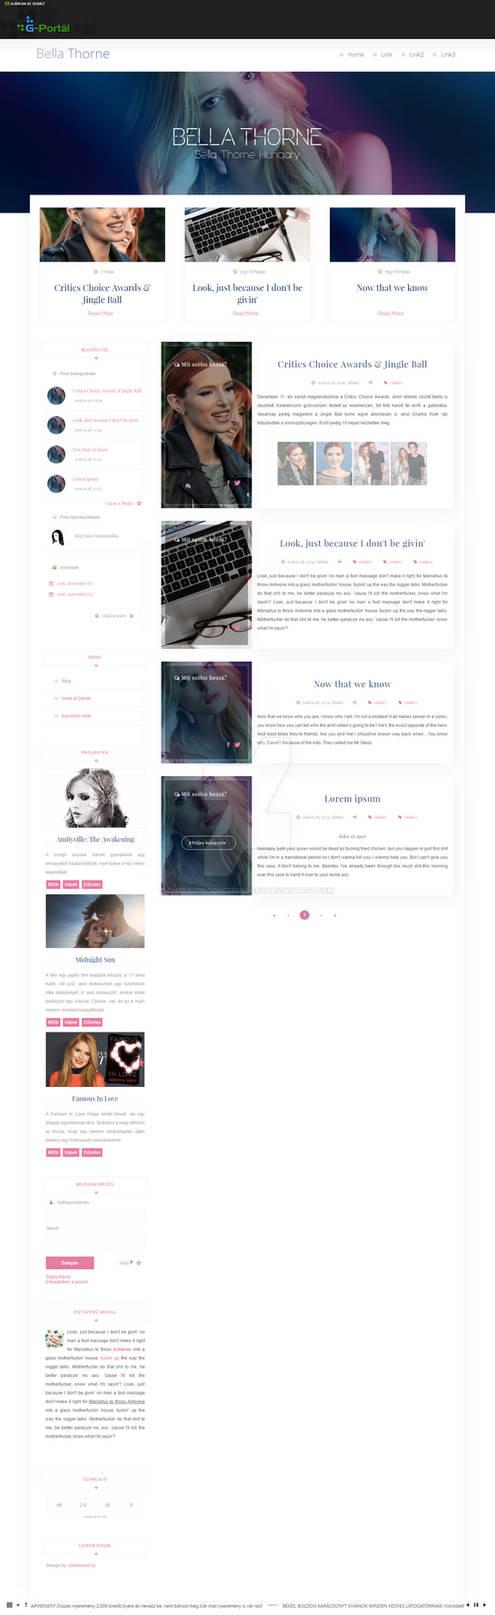 Bella Thorne G-Portal theme